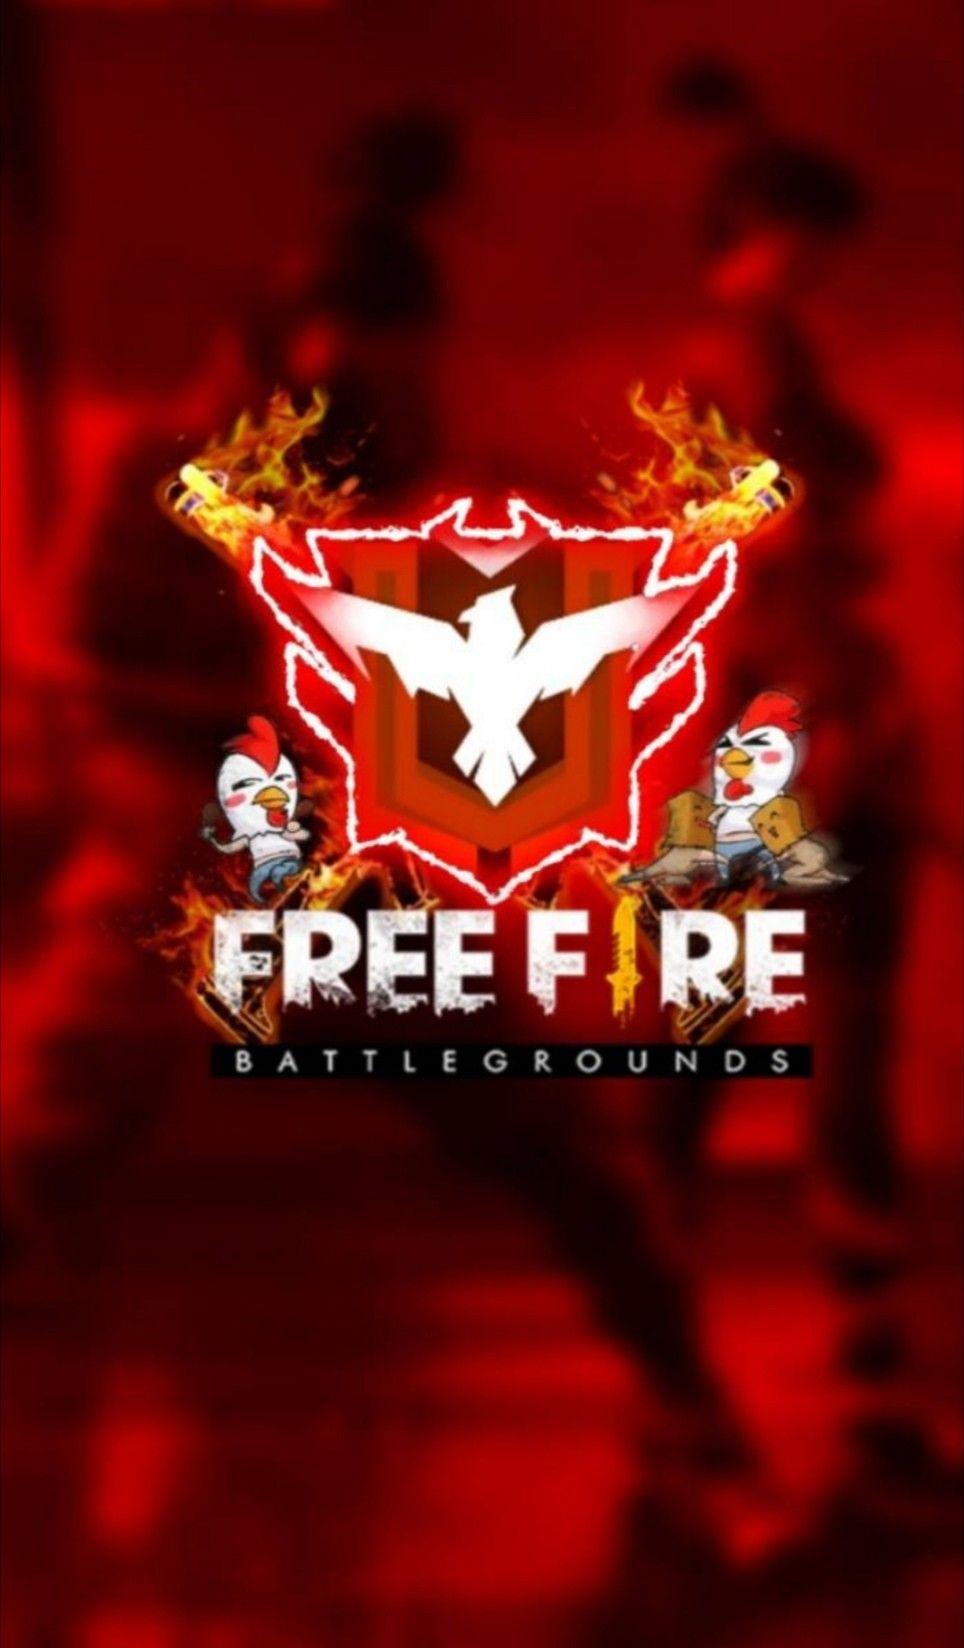 Free Fire Wallpaper In 2021 Download Cute Wallpapers Name Wallpaper Art Logo